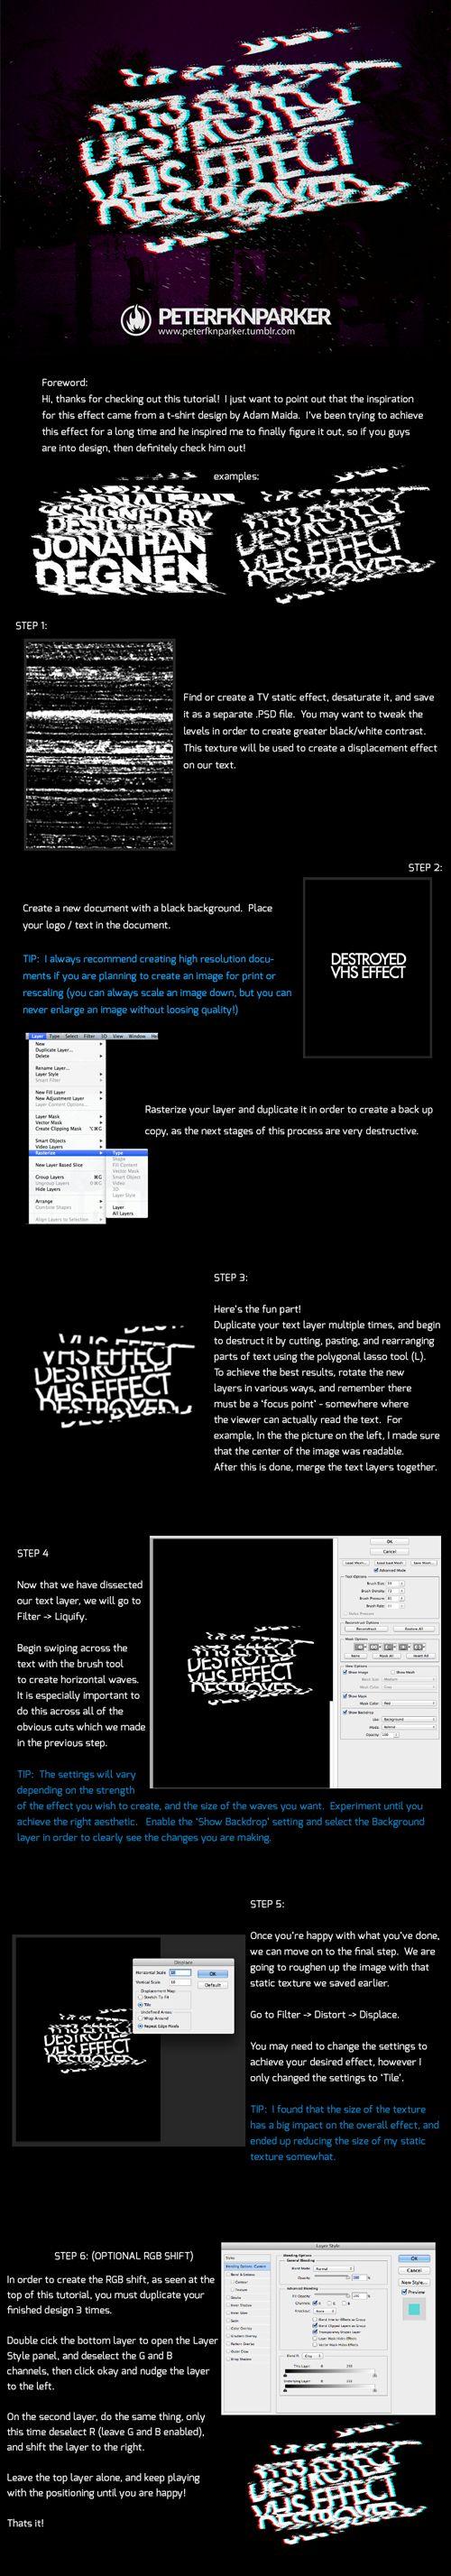 Printing Digital Photography | Photoshop tutorial | Glitch